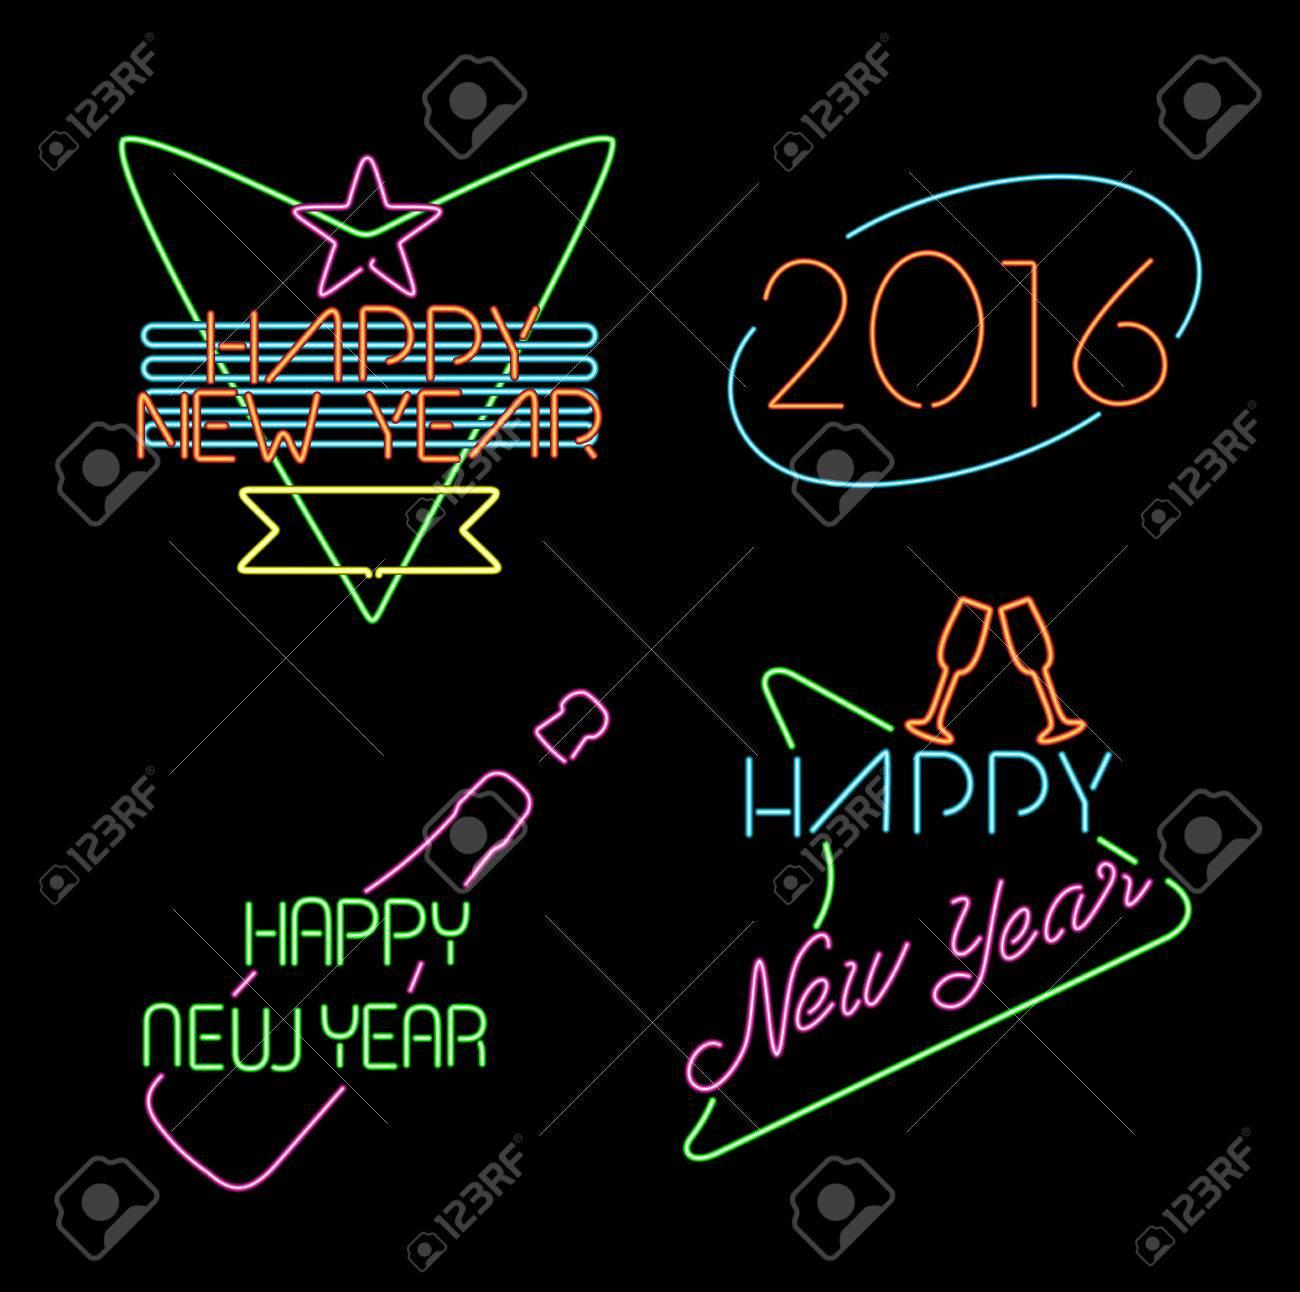 Happy New Year 2016 Neon Light Style Label Set, Retro Designs ...